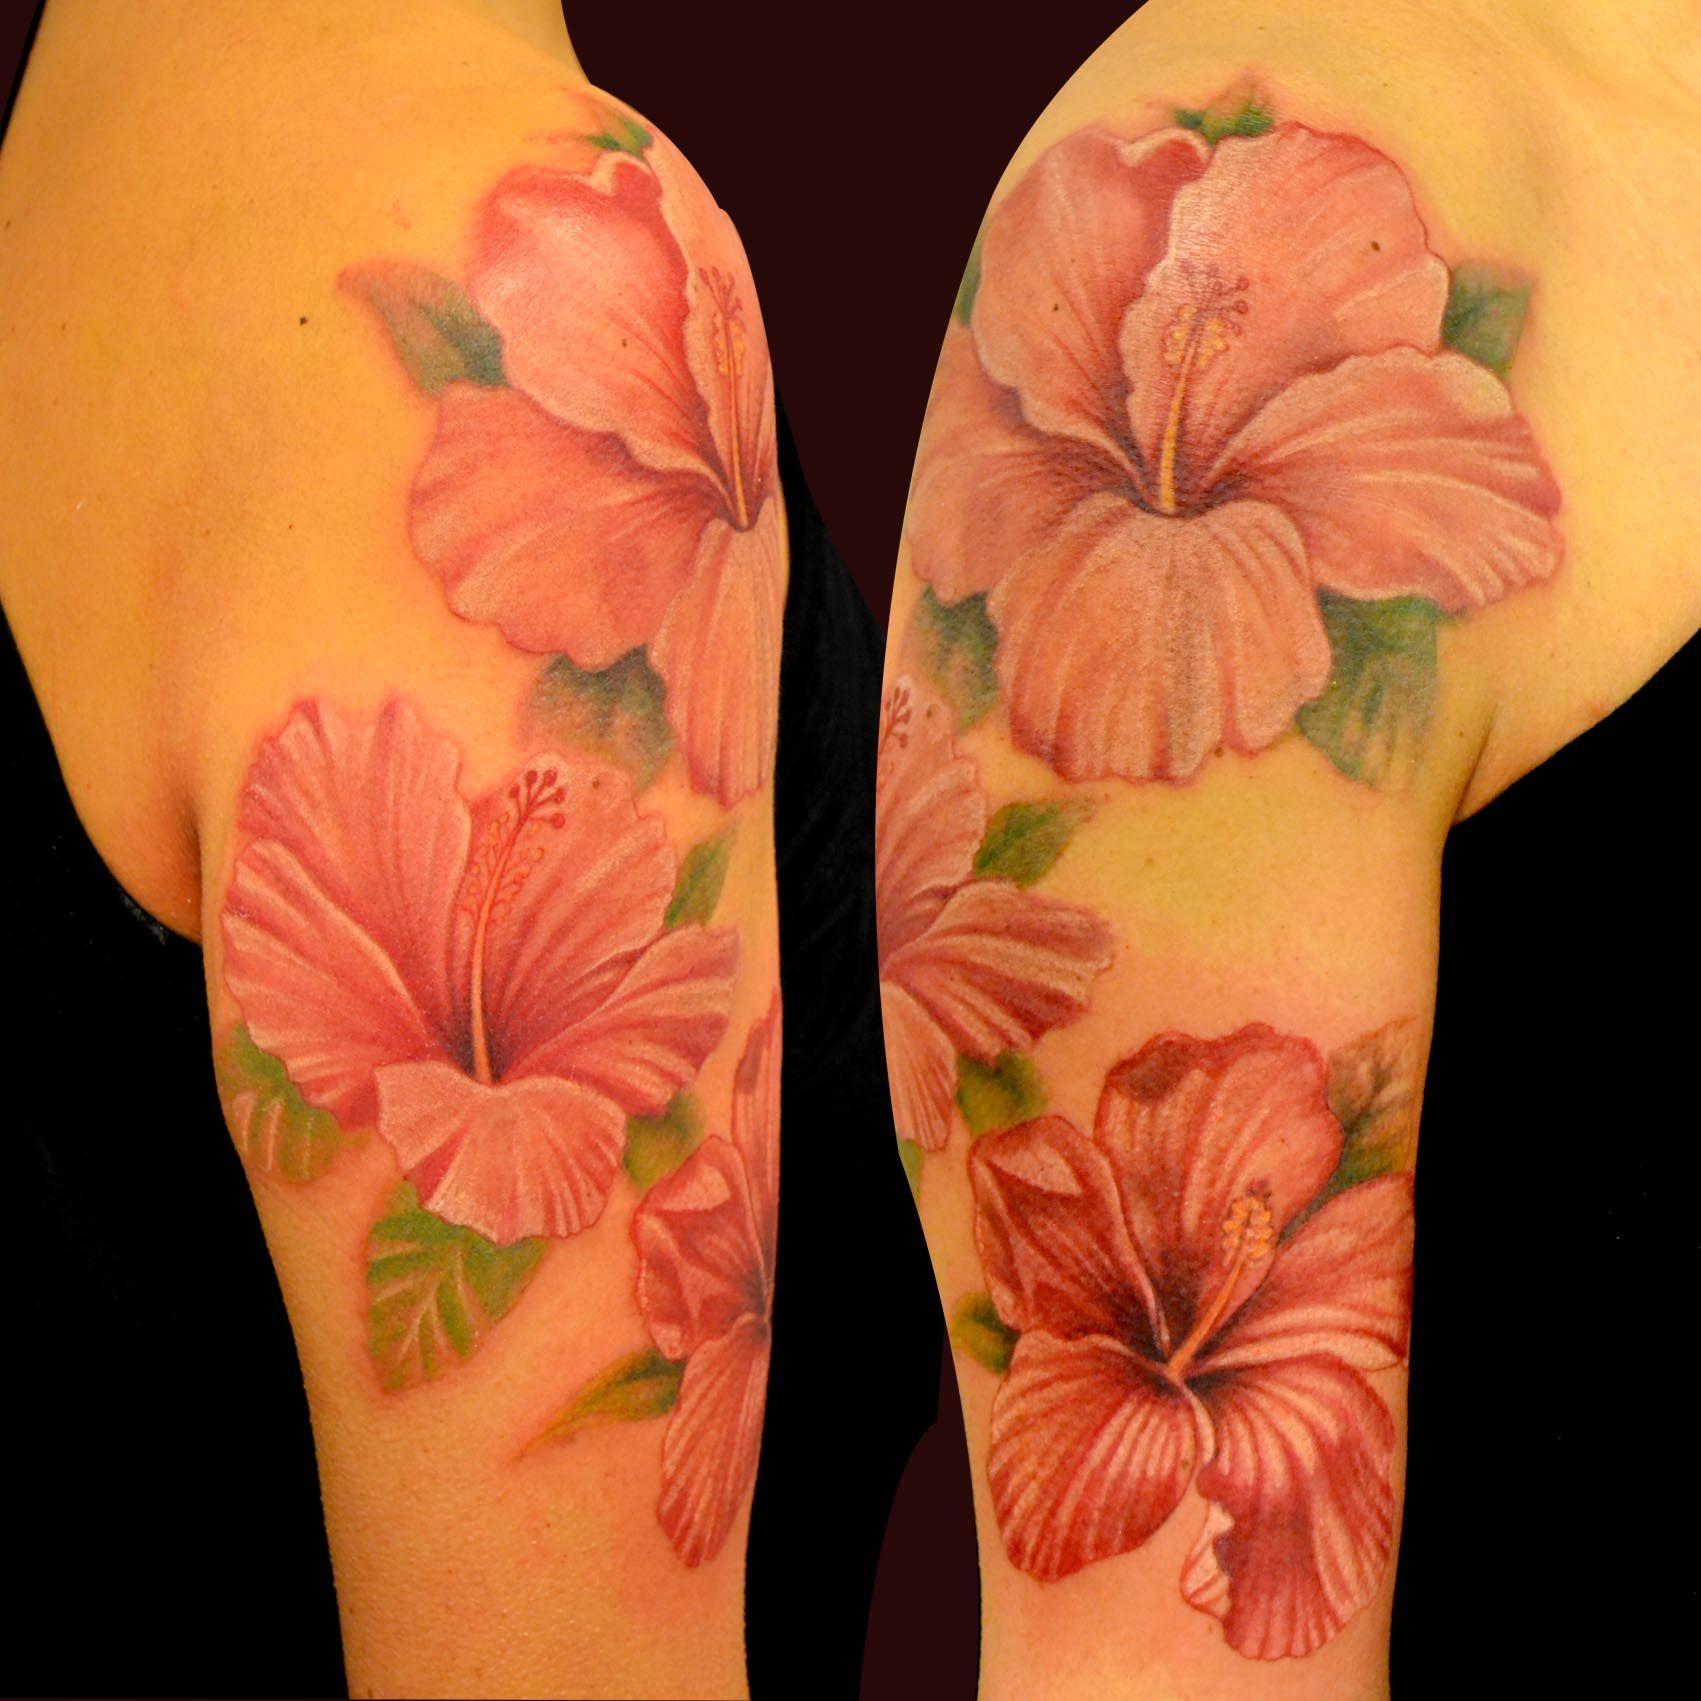 Realistic flowers tattoo my stuff pinterest realistic flower realistic flowers tattoo izmirmasajfo Images